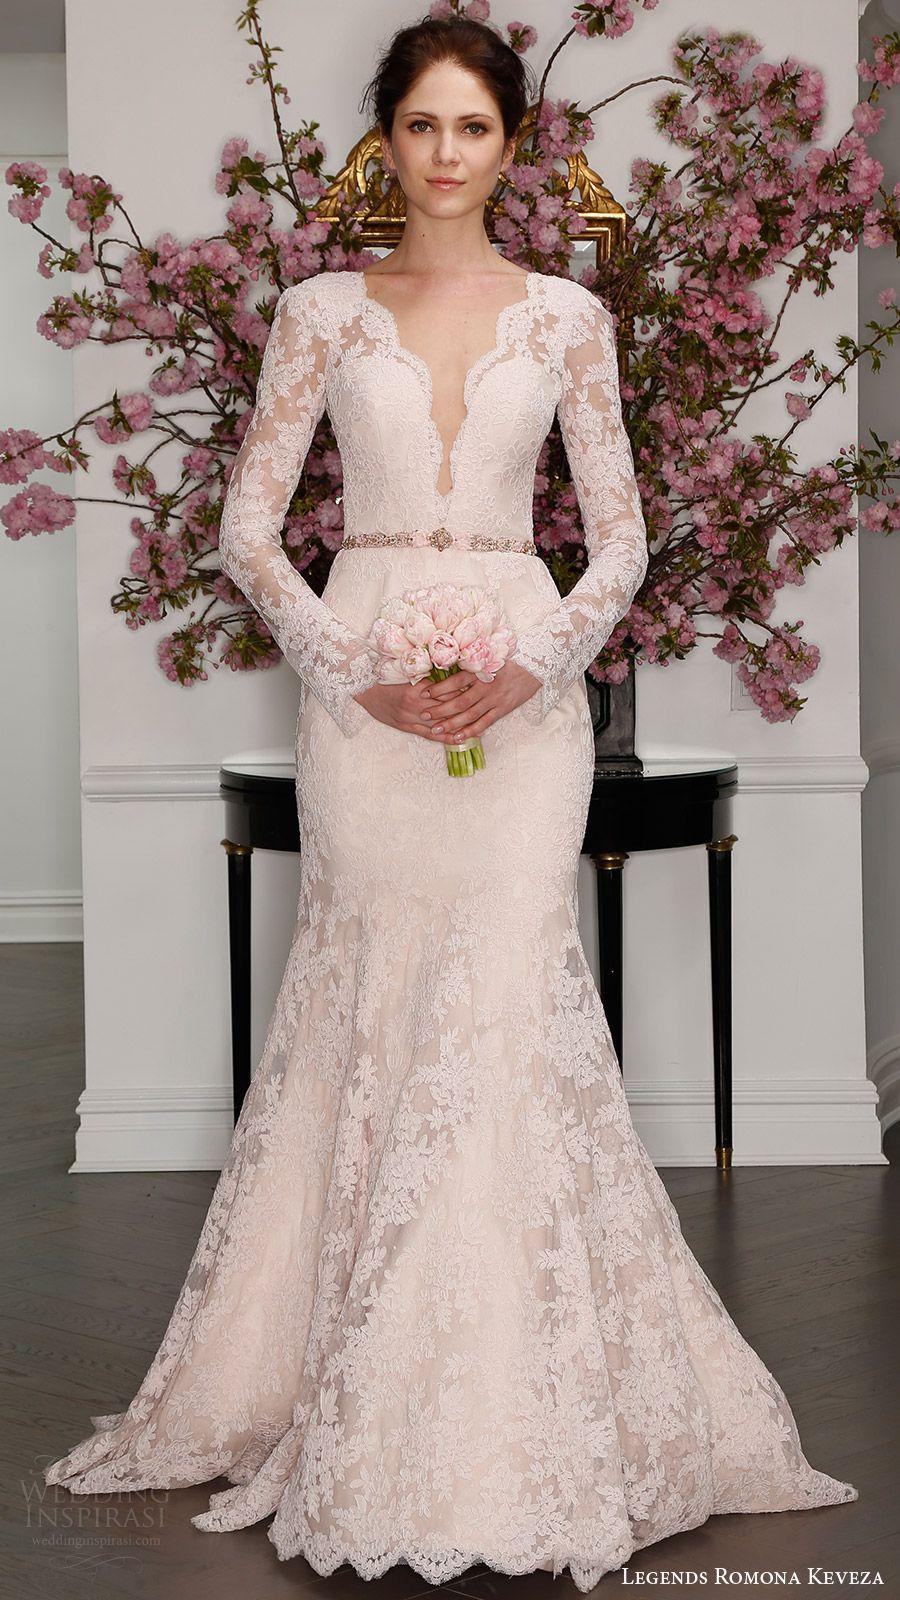 Legends Romona Keveza Spring 2017 Wedding Dresses | I\'M THE BRIDE ...